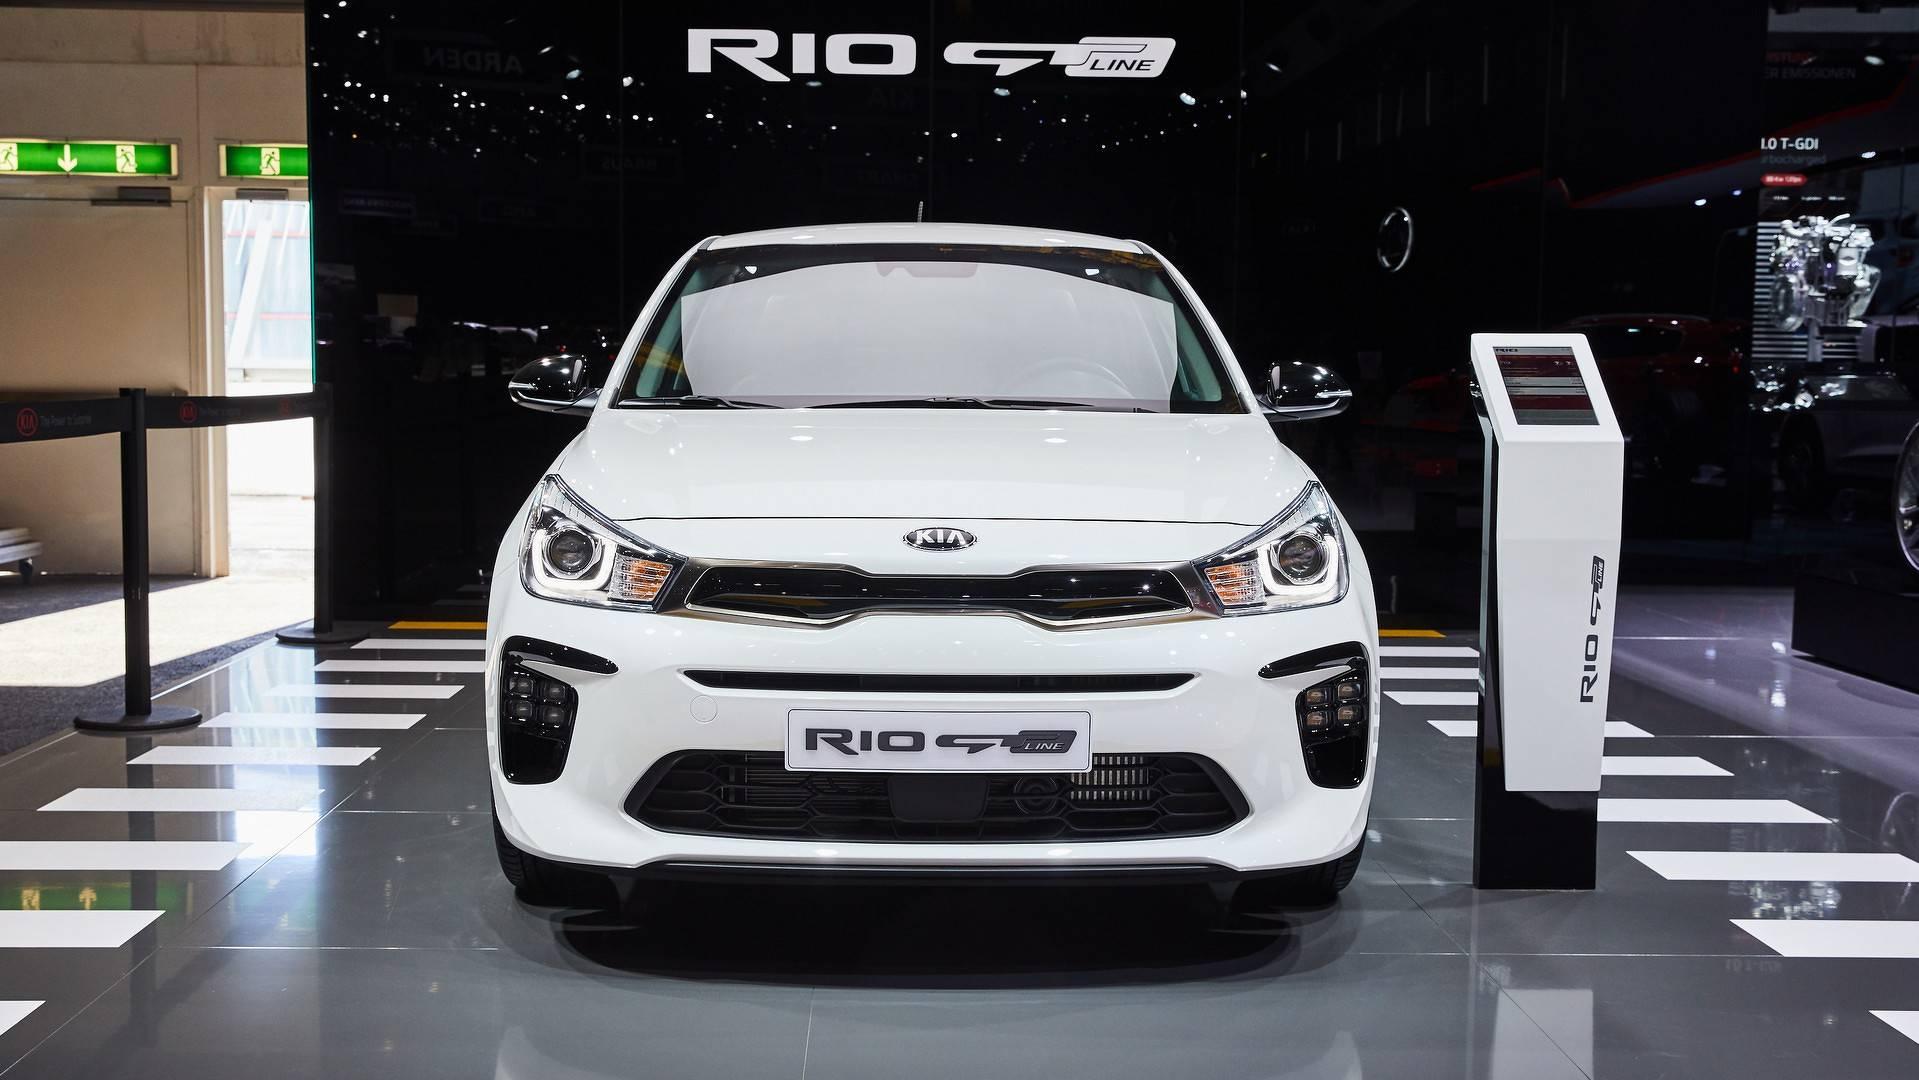 Kia Rio Gt Line Live From Geneva Motor Show